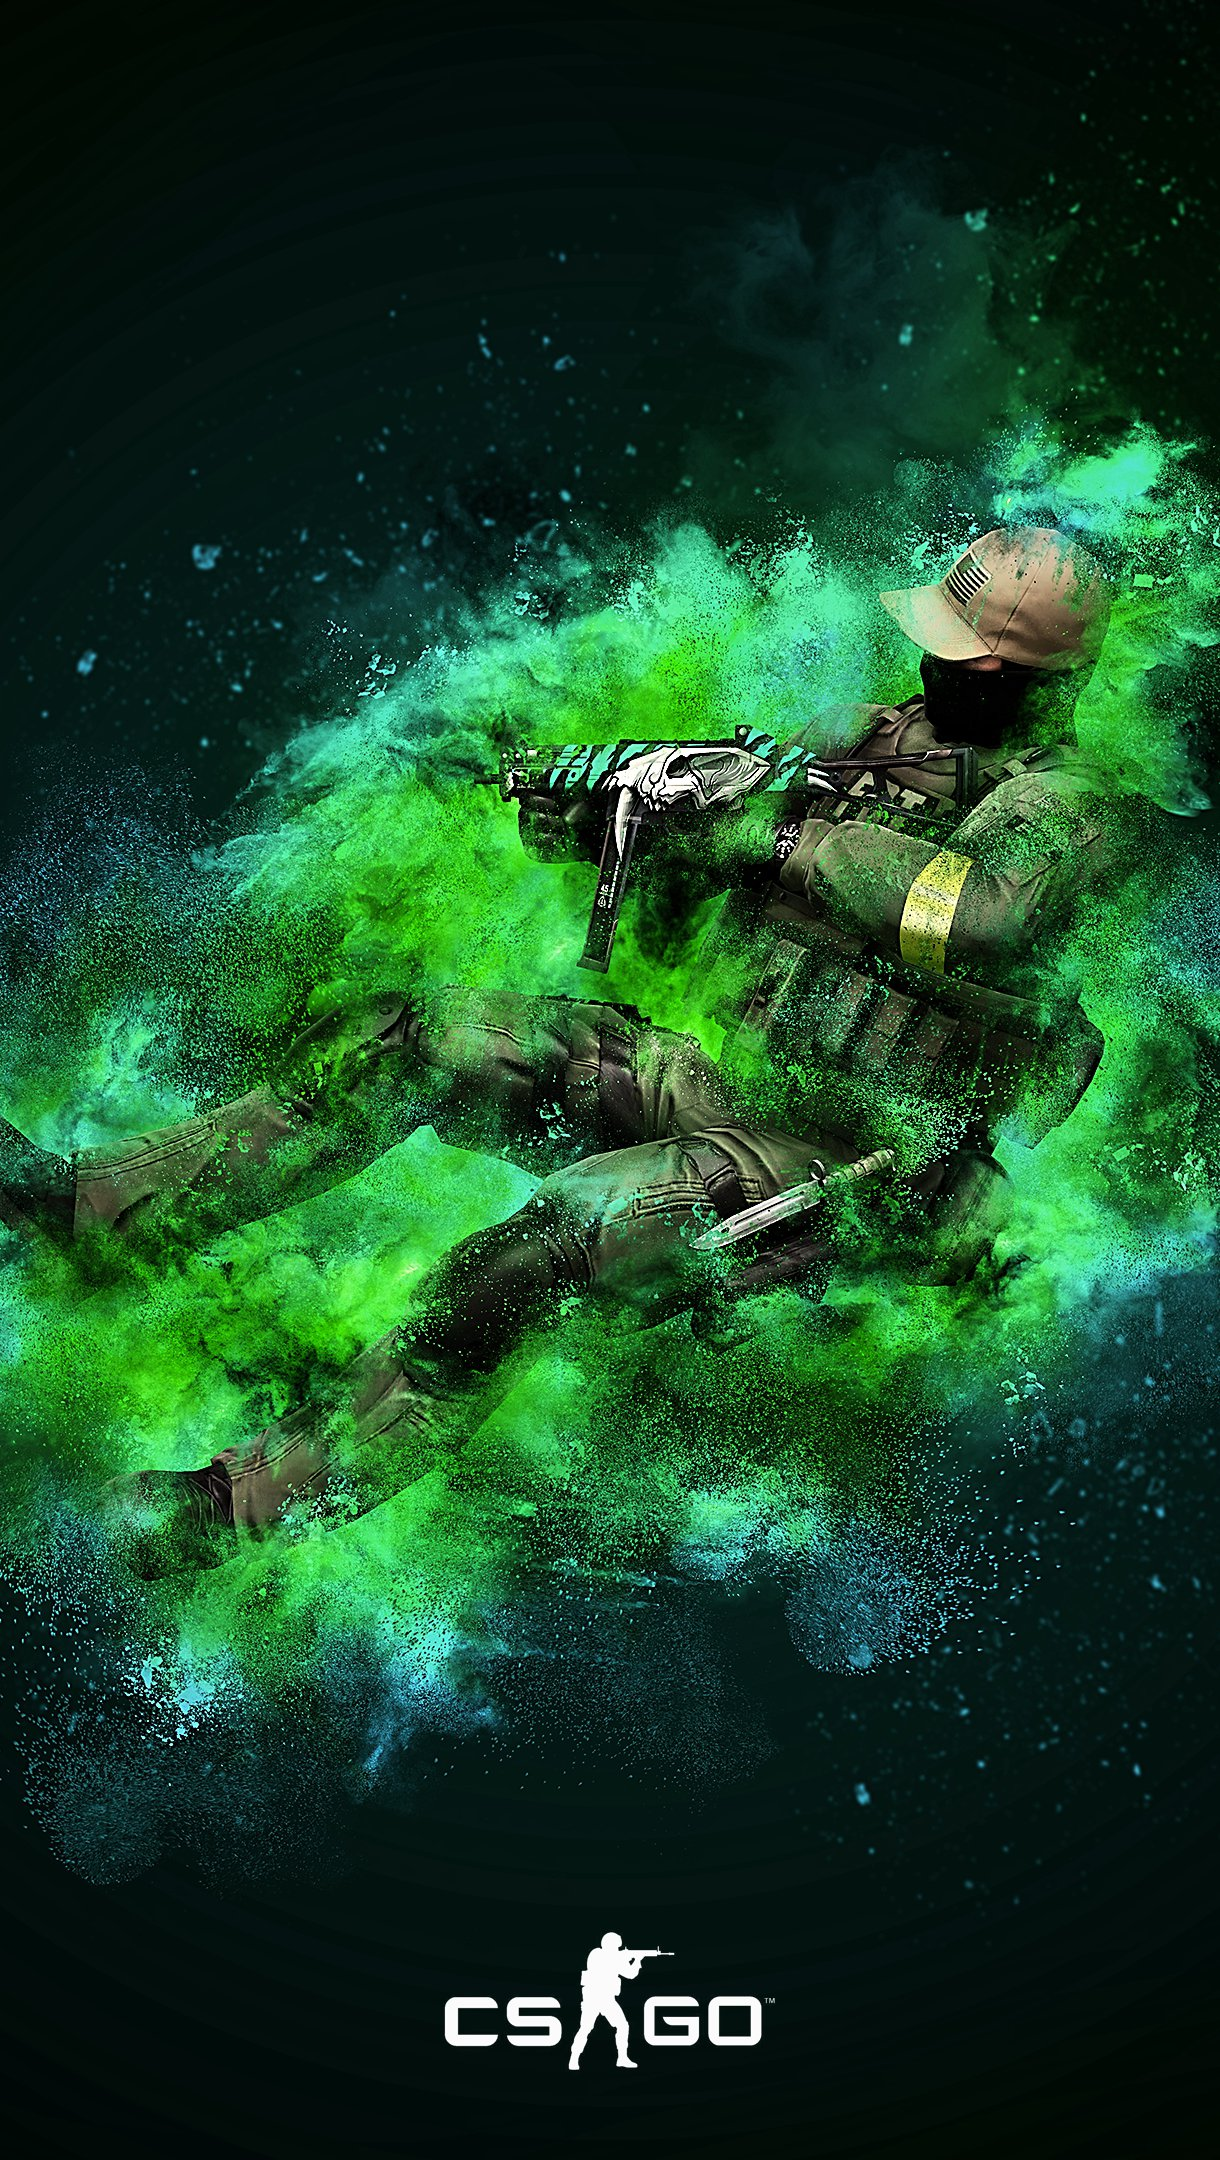 Wallpaper Counter Strike: Global Offensive CSGO Vertical